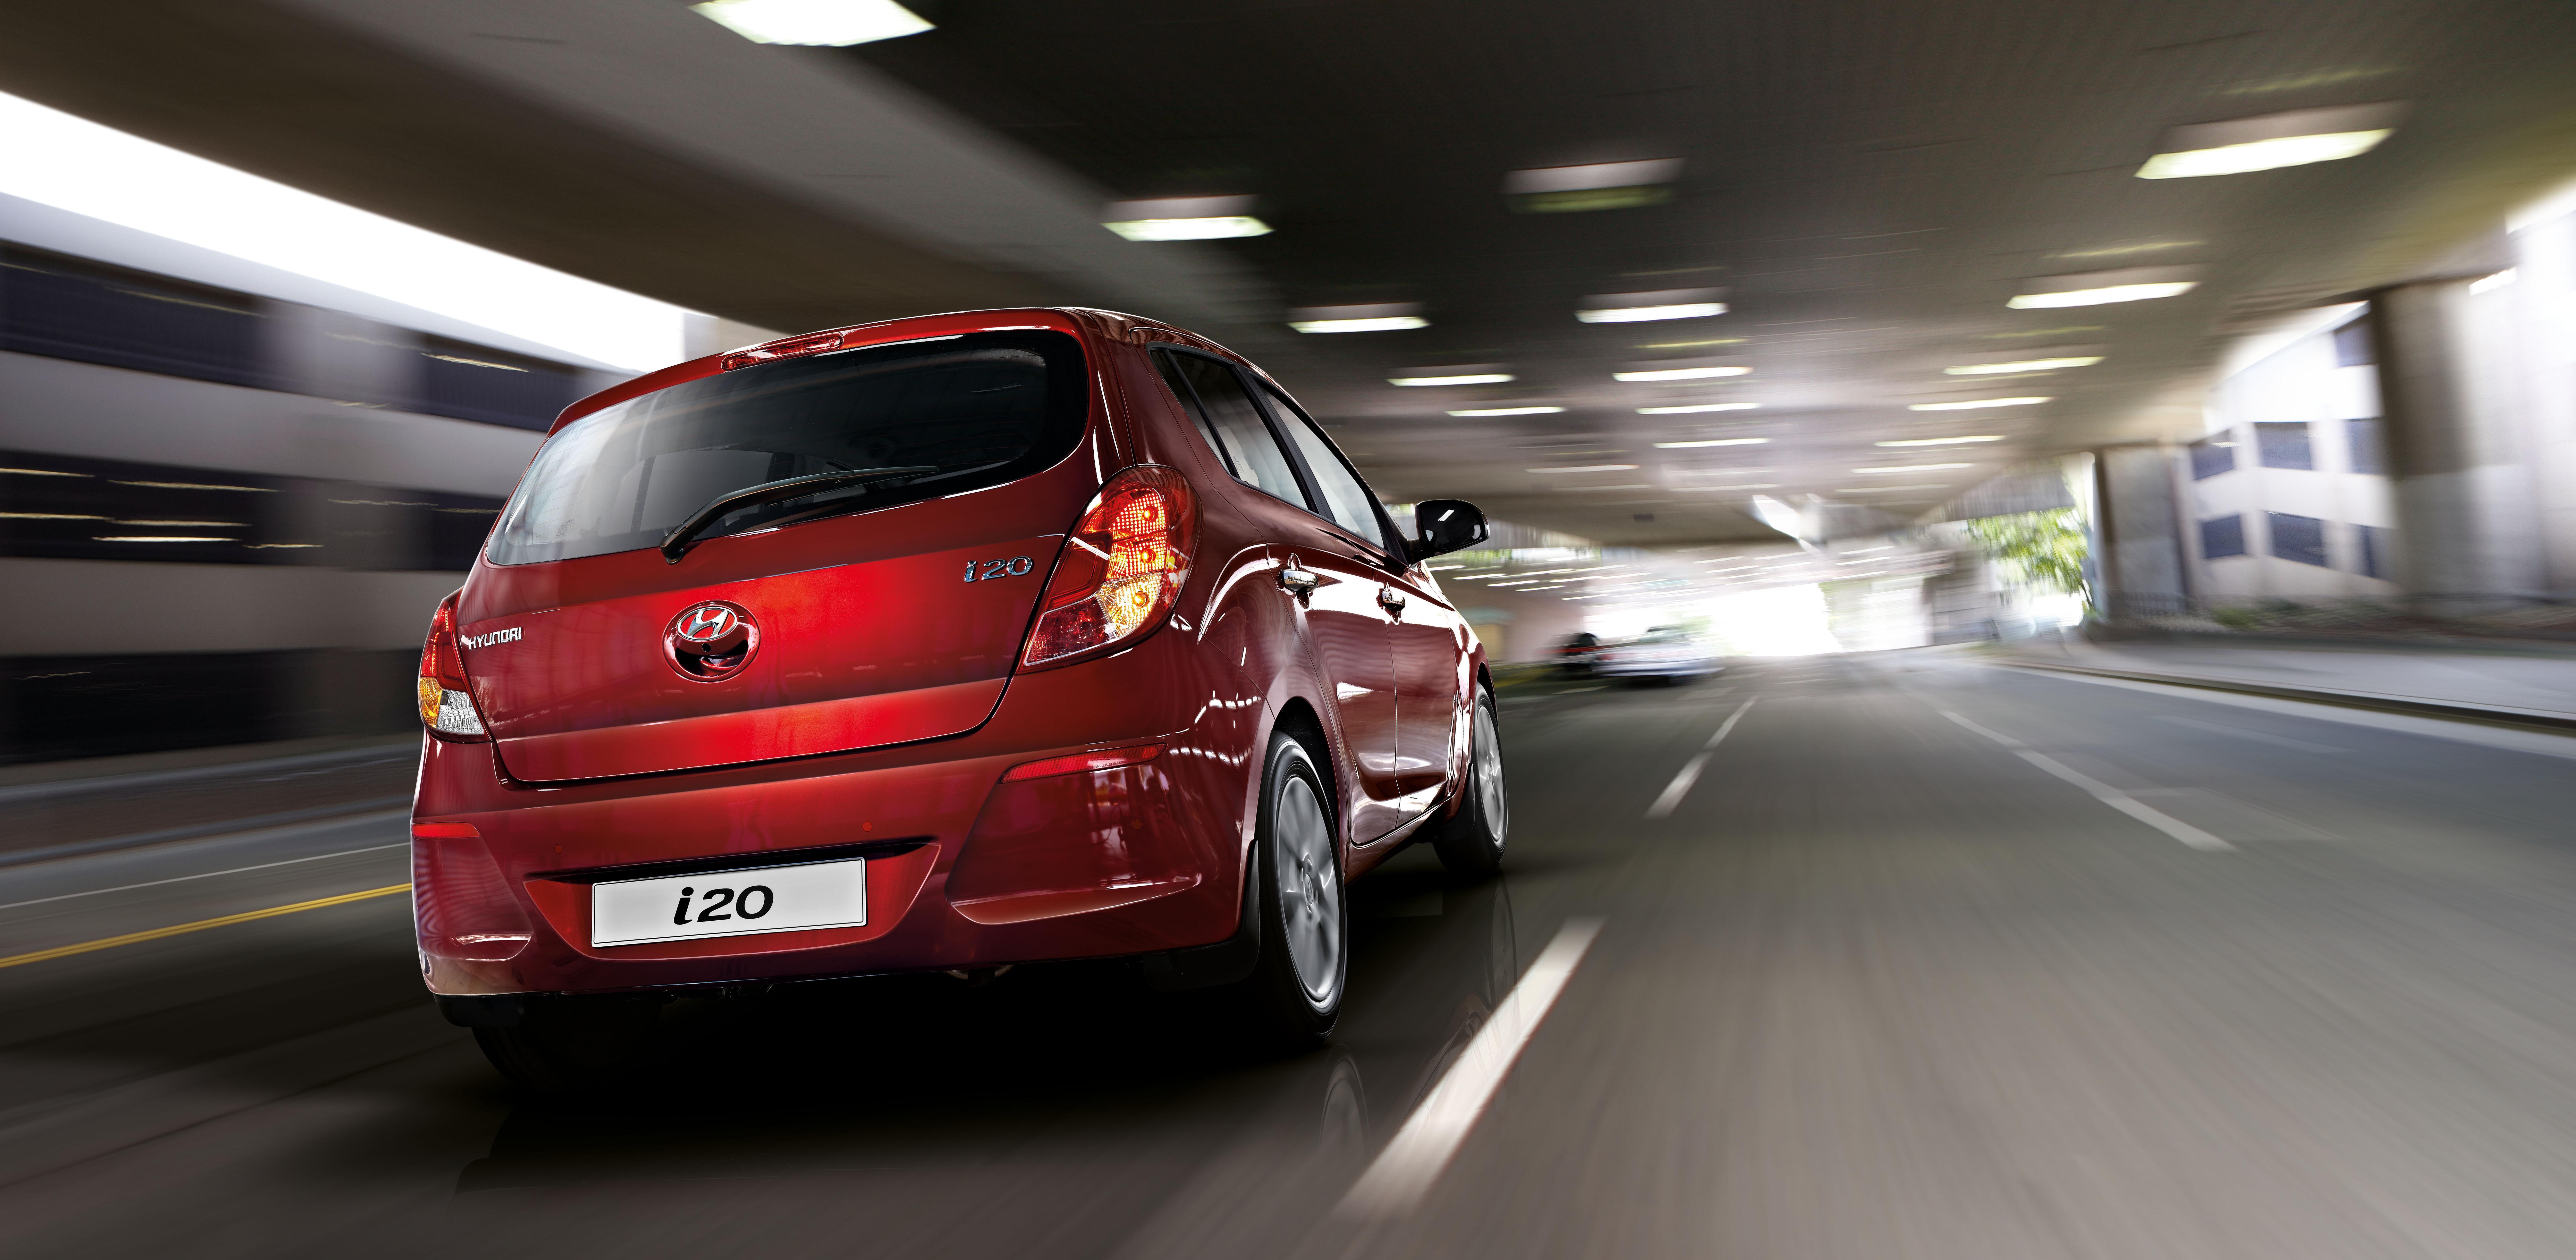 Hyundai i20 hatchback: Gadgets and gizmos galore - NZ Herald